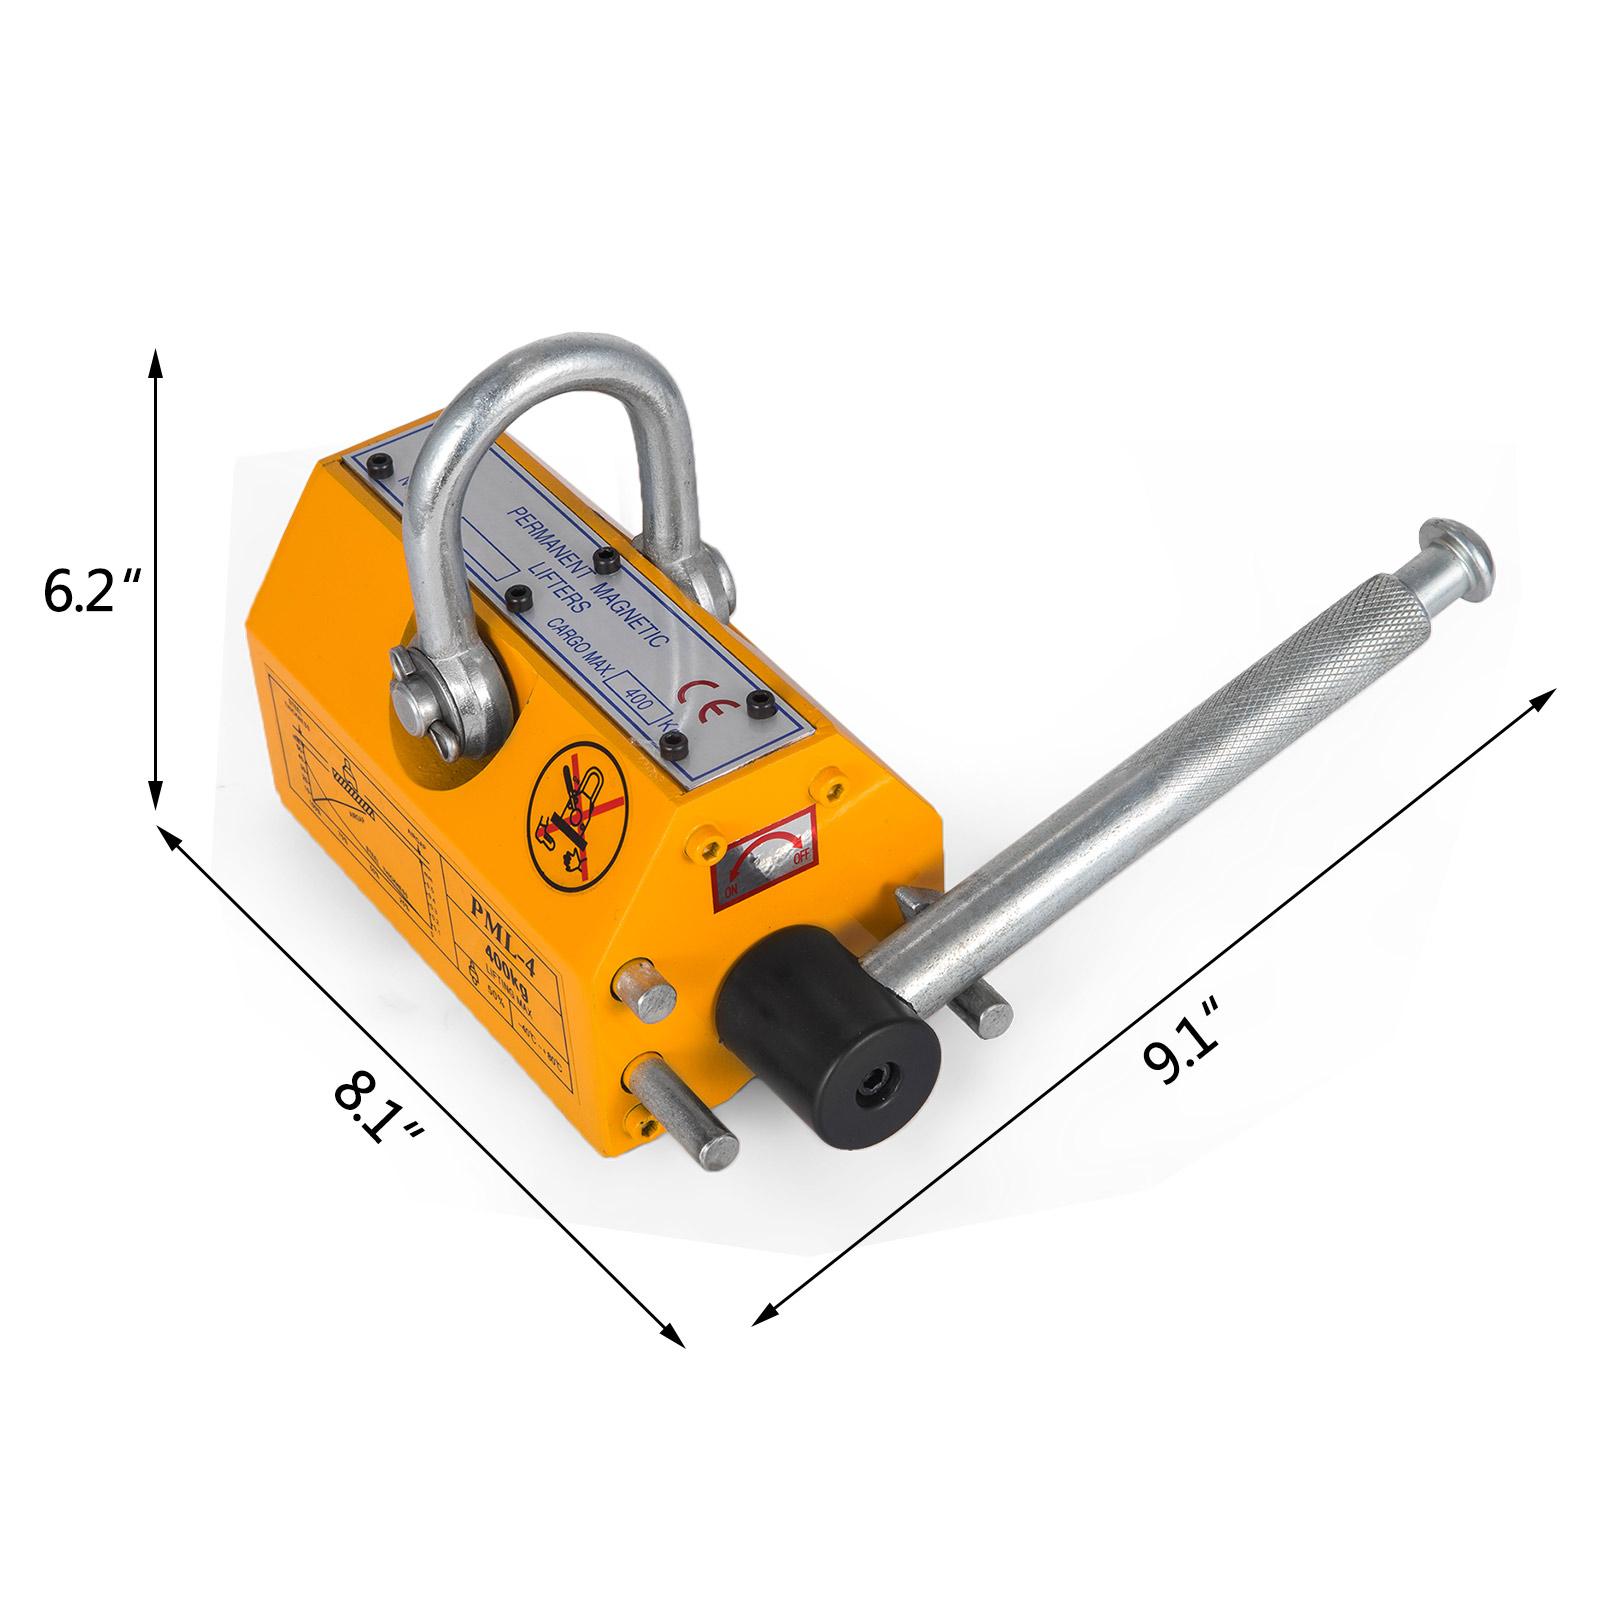 100-300-600-1000KG-Steel-Magnetic-Lifter-Heavy-Duty-Crane-Hoist-Lifting-Magnet miniature 38